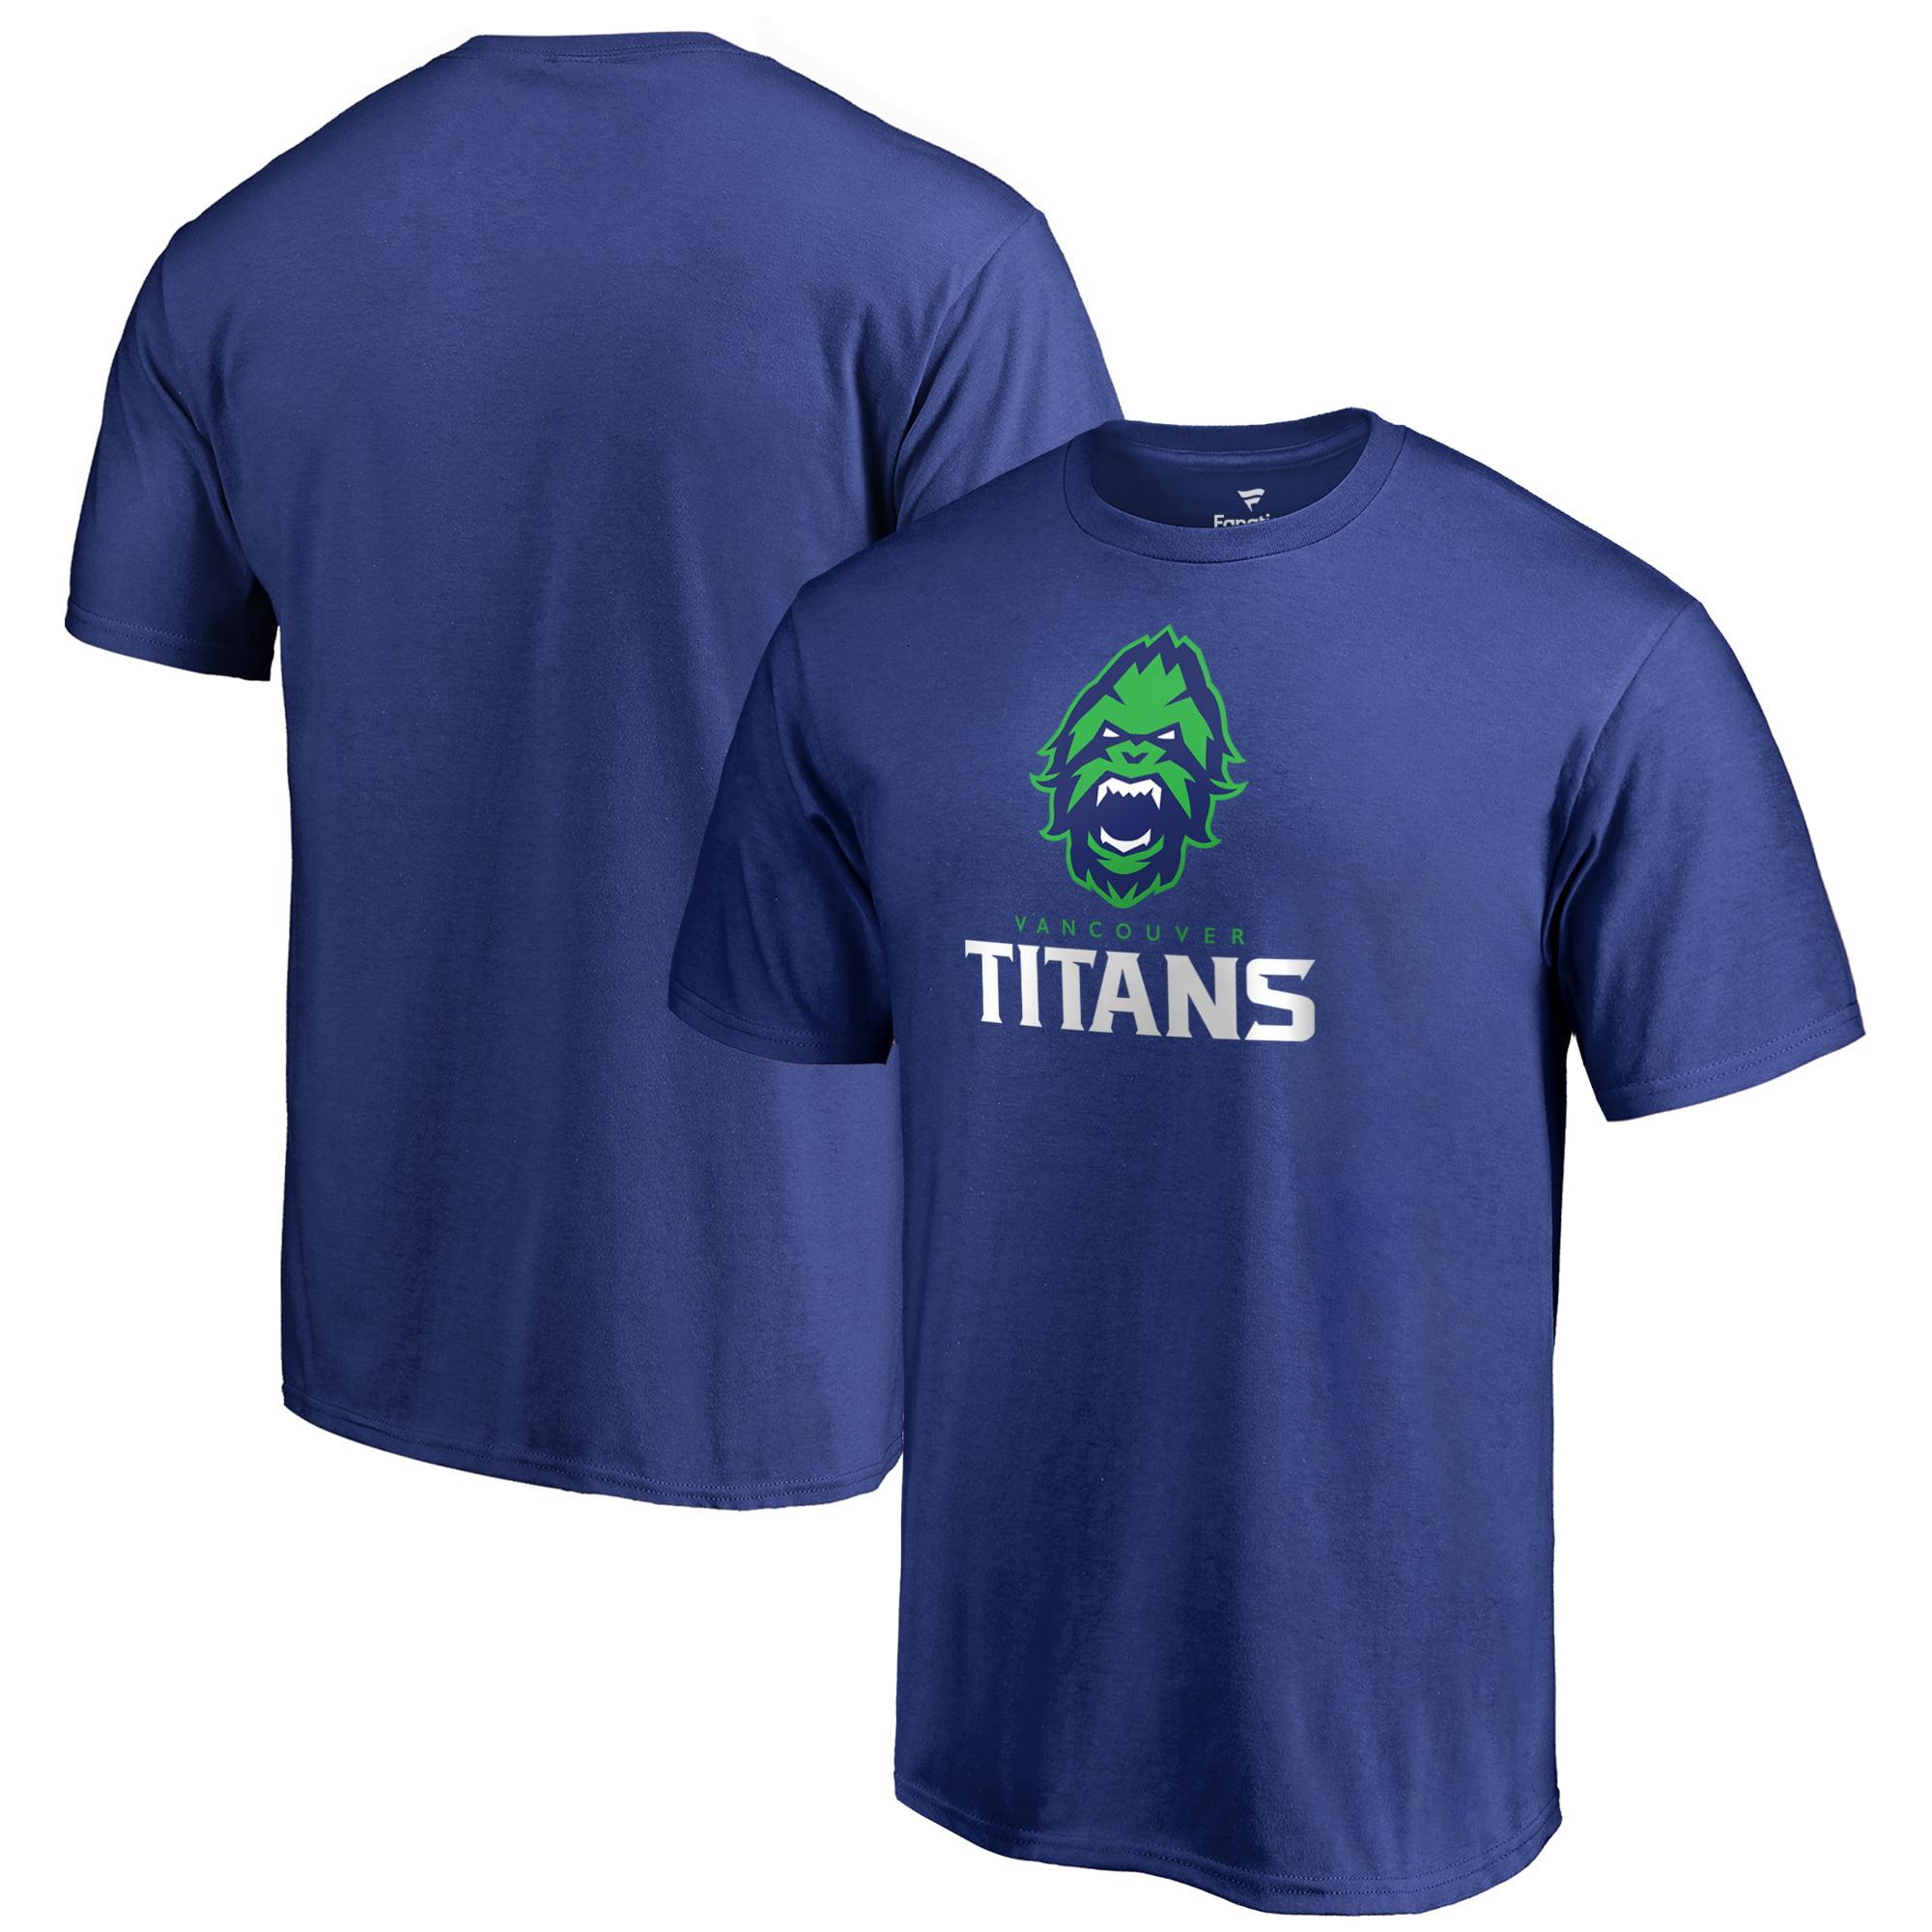 Vancouver Titans Fanatics Branded Team Identity T-Shirt - Royal